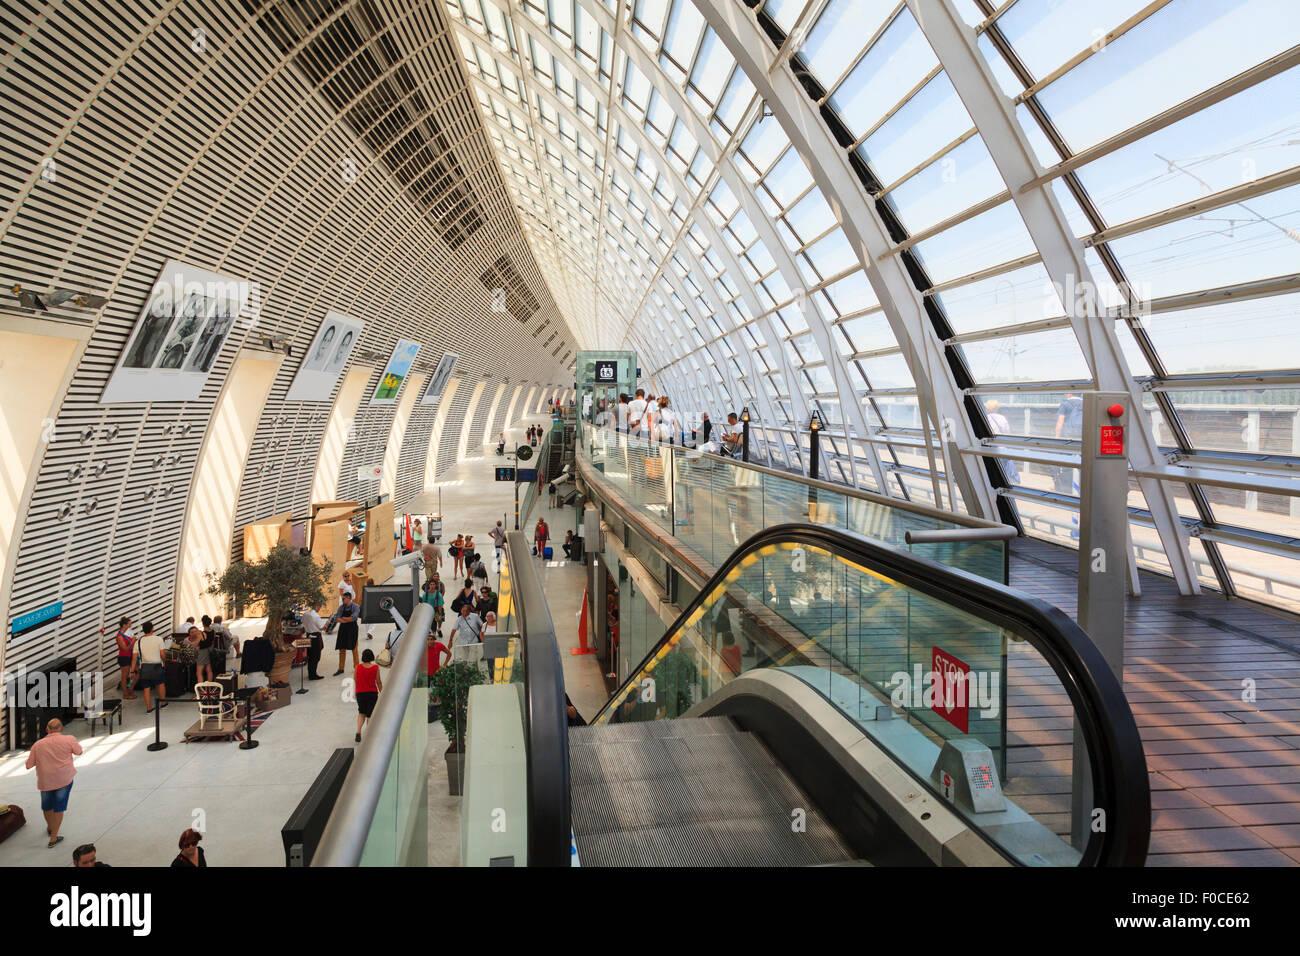 Escalera mecánica en el interior de la moderna arquitectura Avignon TGV railway station Imagen De Stock